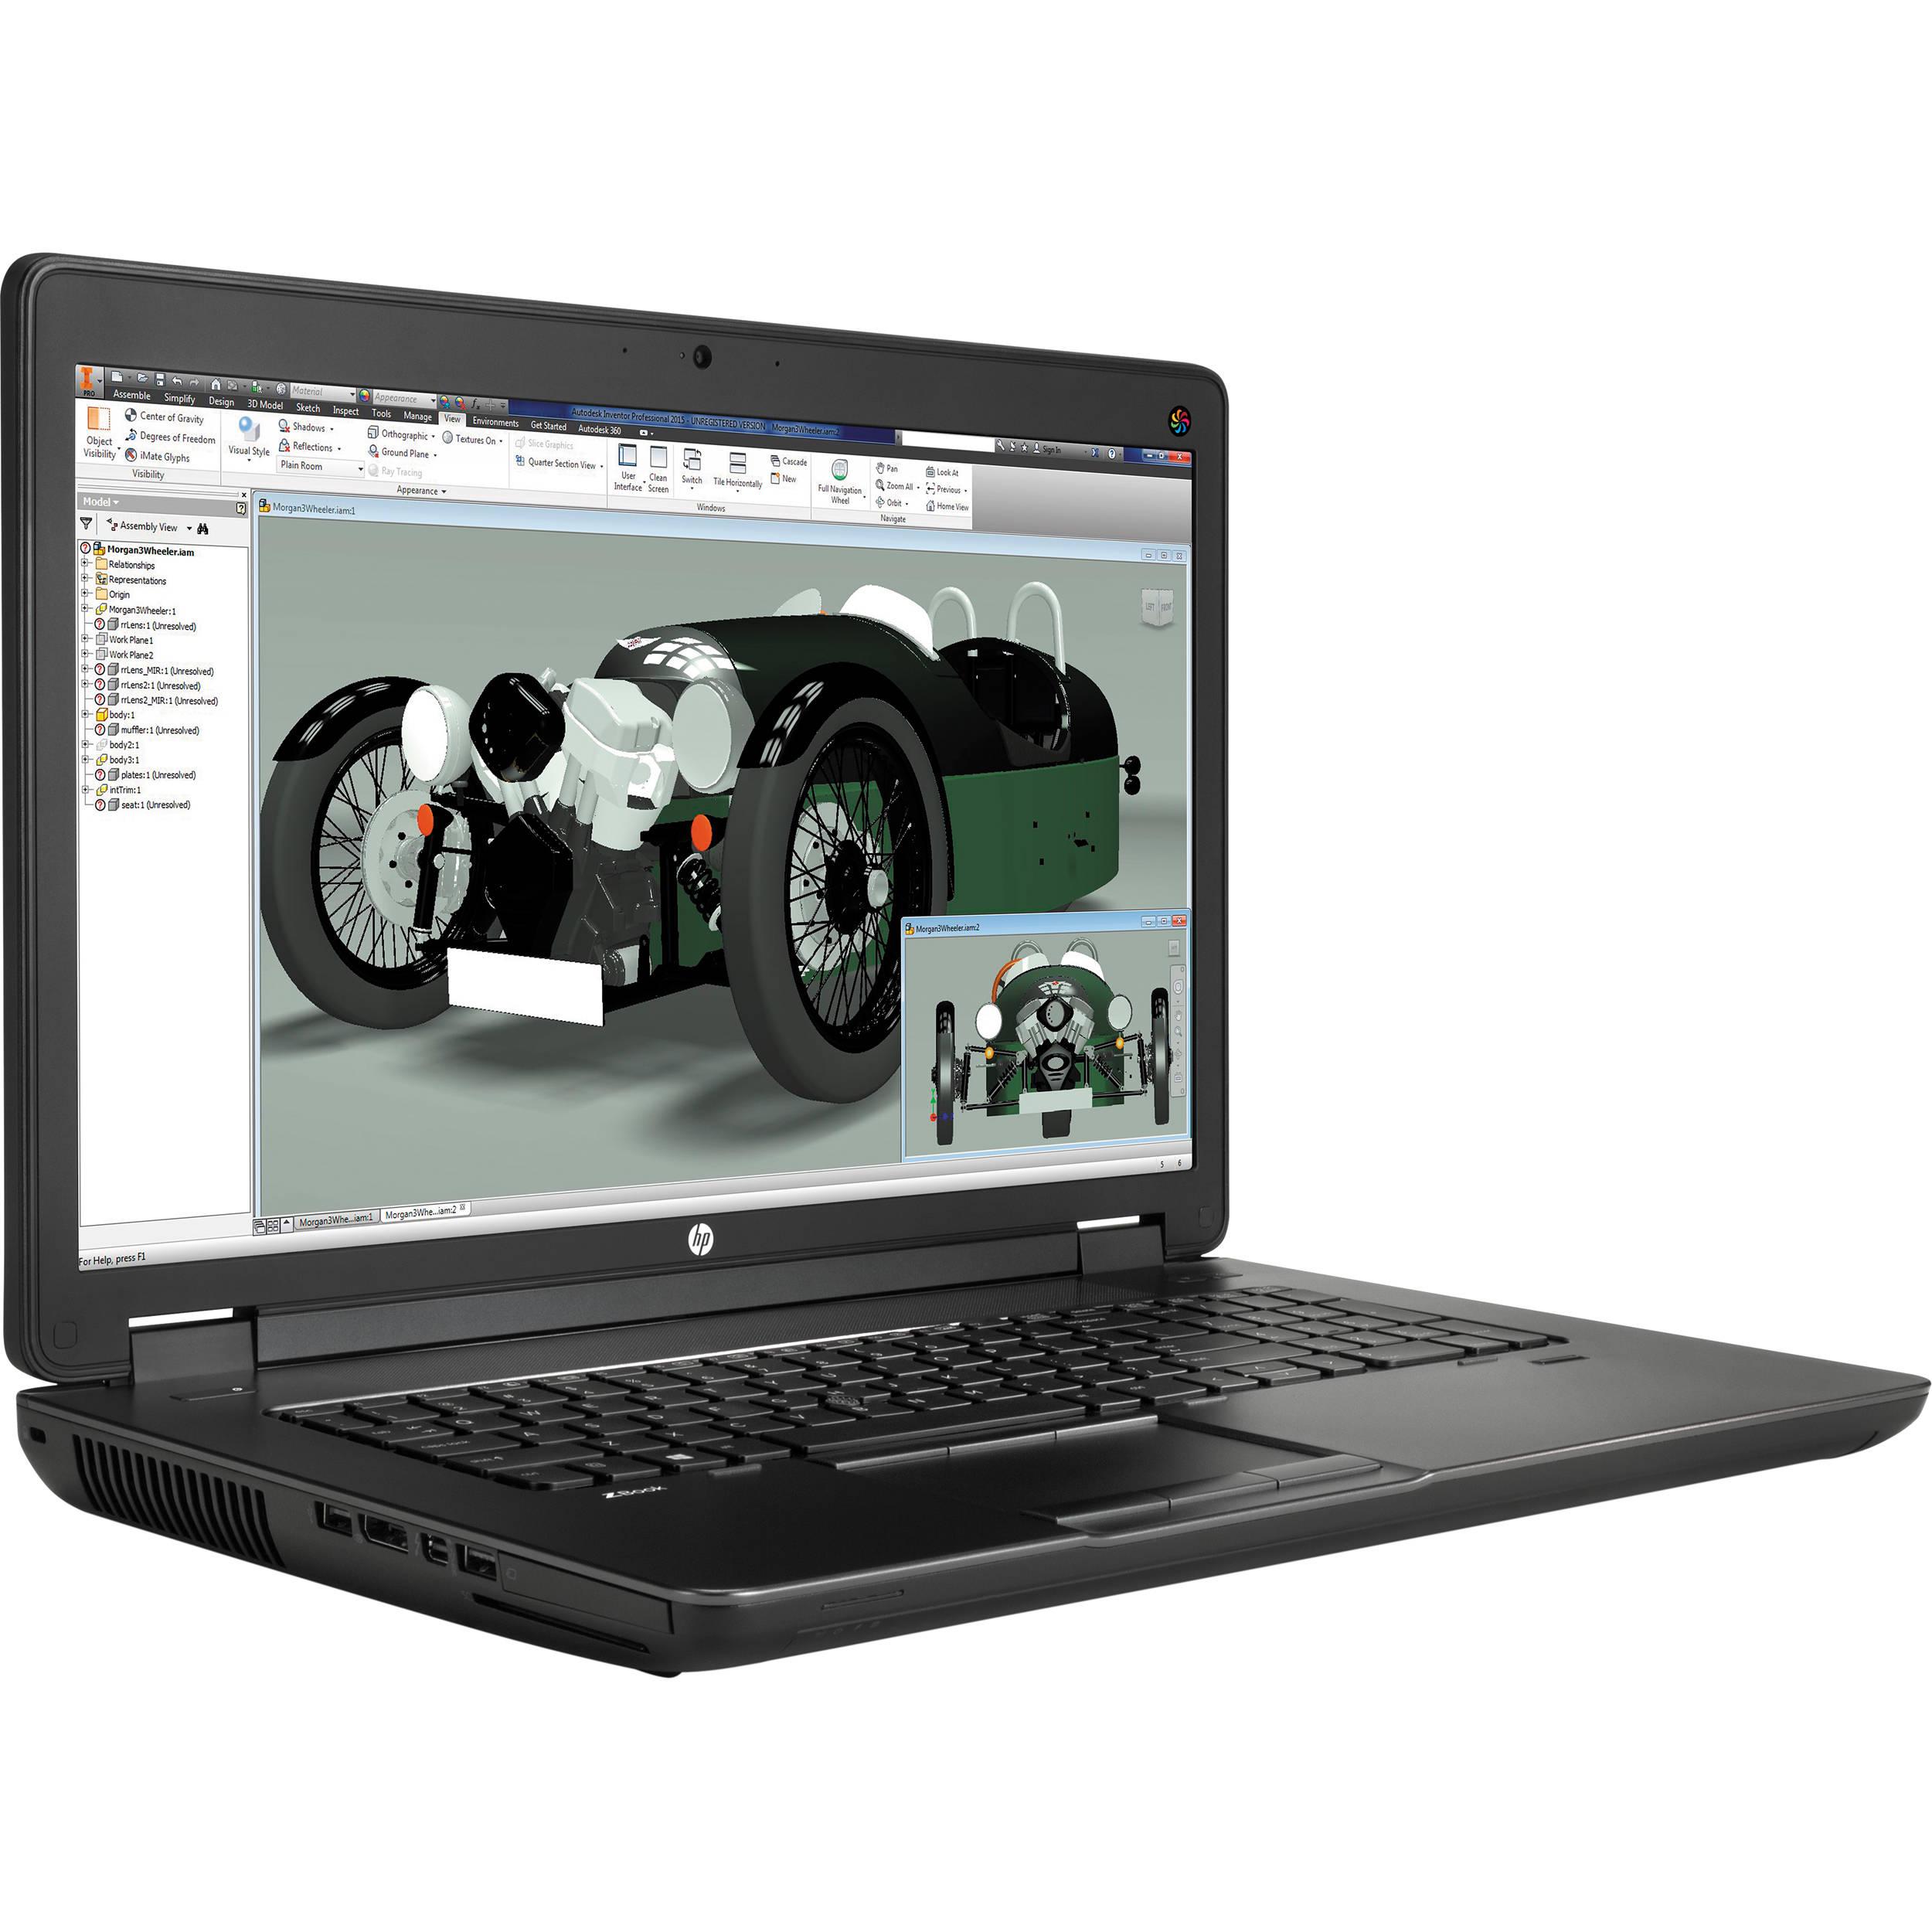 HP ZBook 17 G6 Mobile Workstation (8FP99UT#ABA)